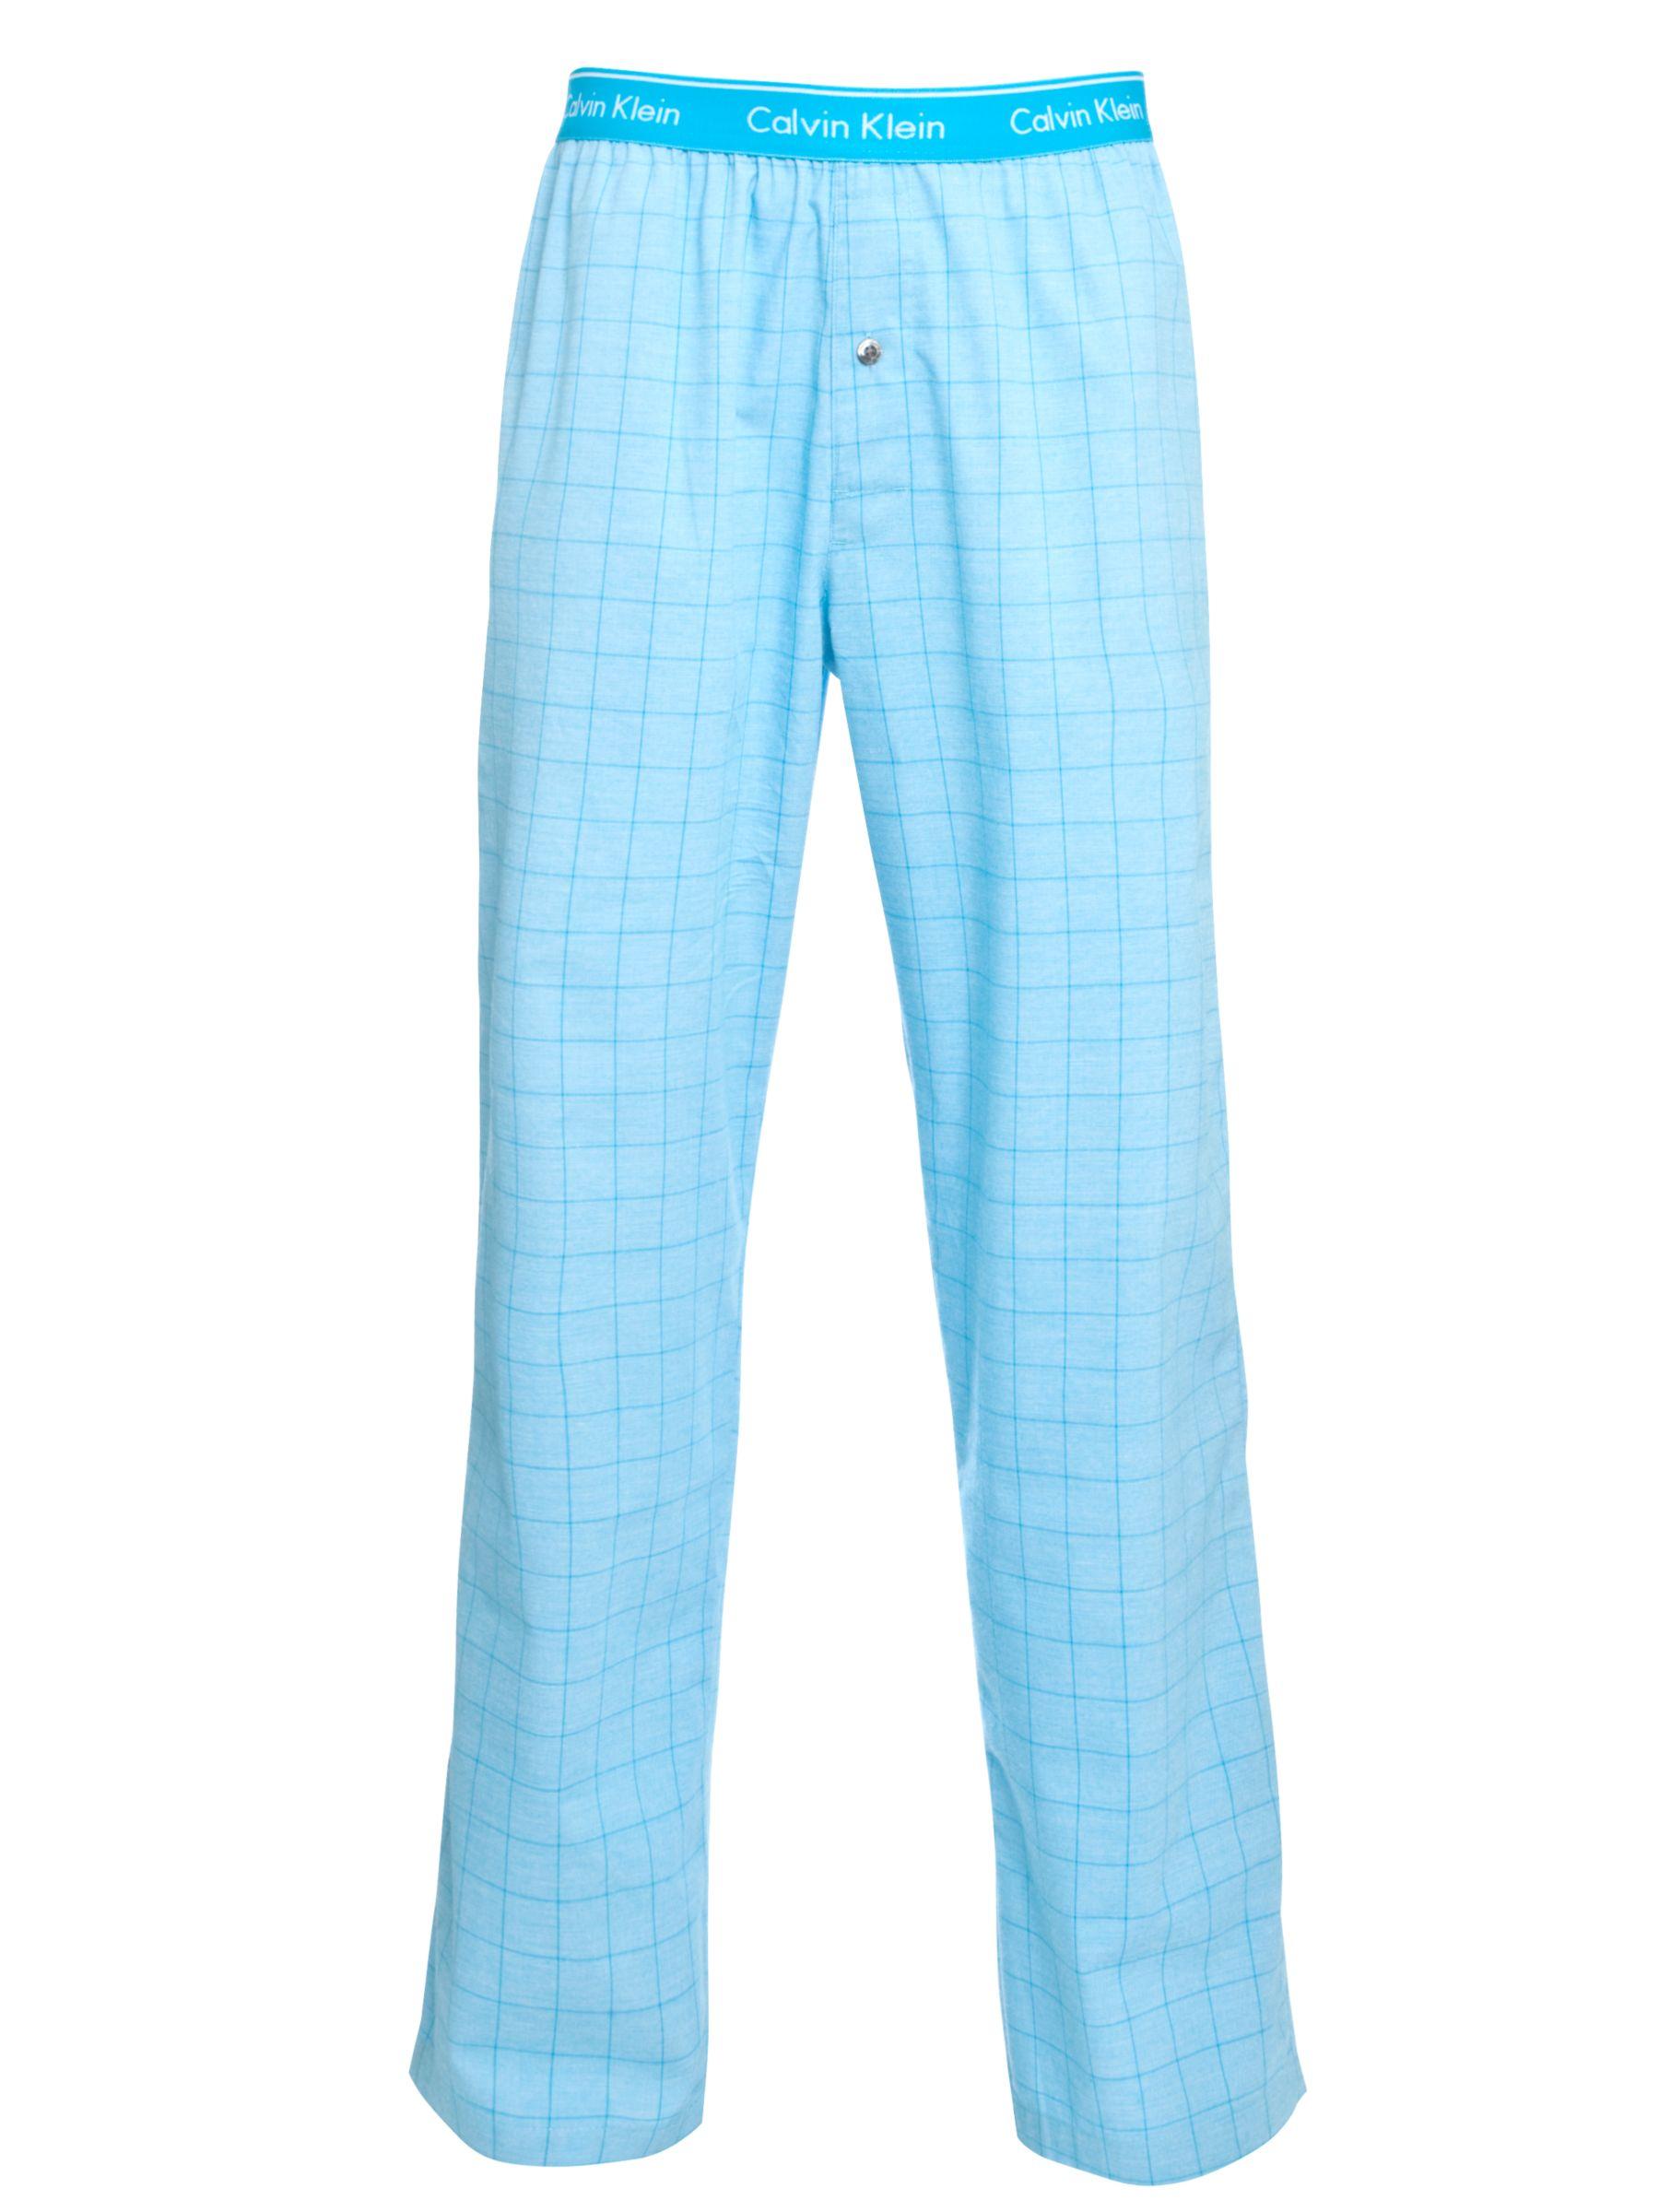 Calvin Klein Trevor Woven Cotton Check Pyjama Pants, Turquoise